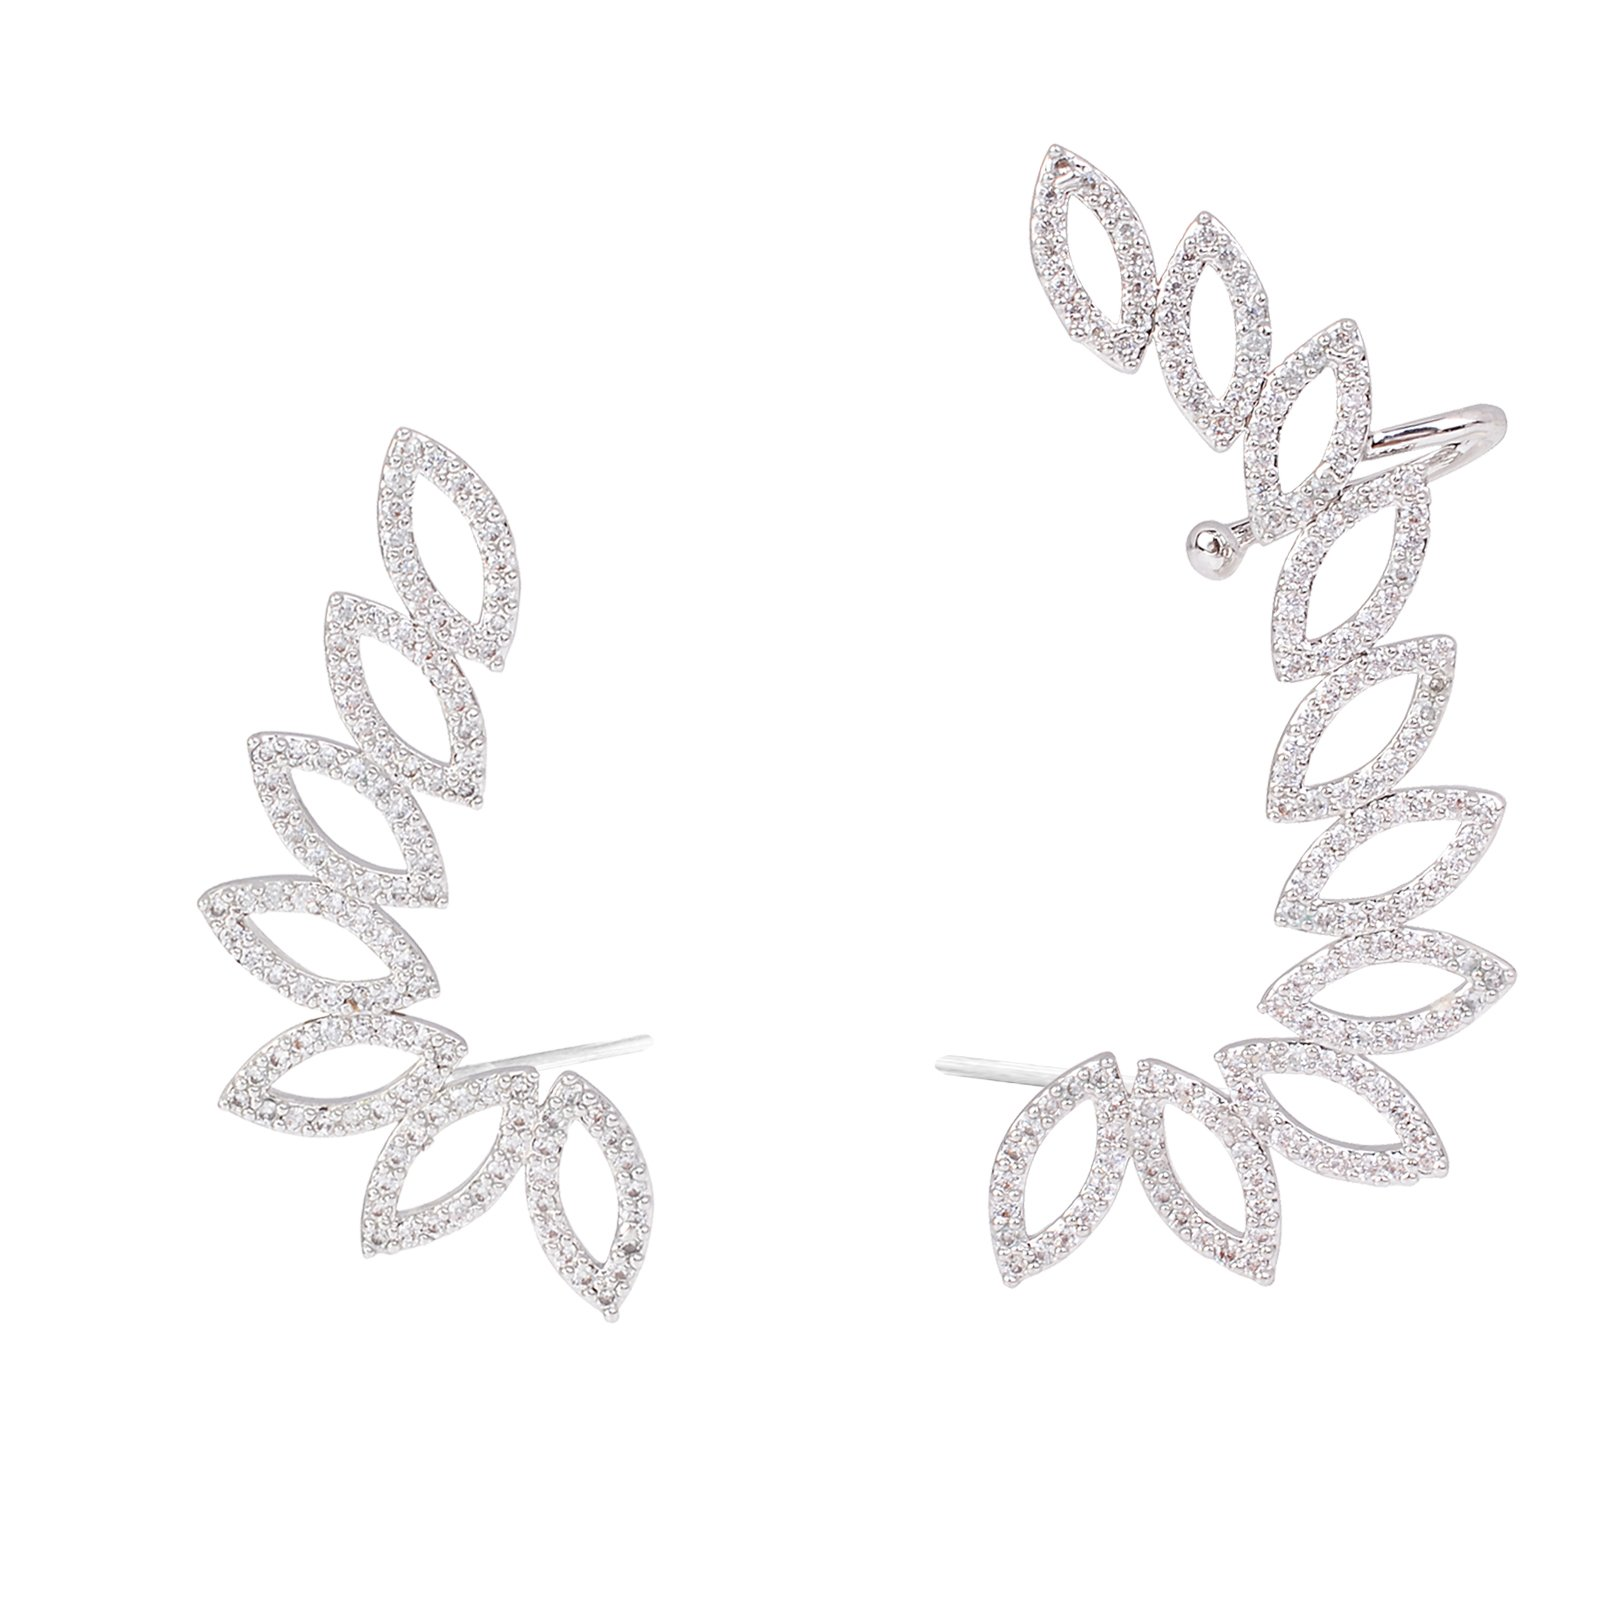 OBONNIE Women's 925 Sterling Silver CZ Crystal Leaf Flower Petals Right Ear Cuffs Clip Earrings Stud Set